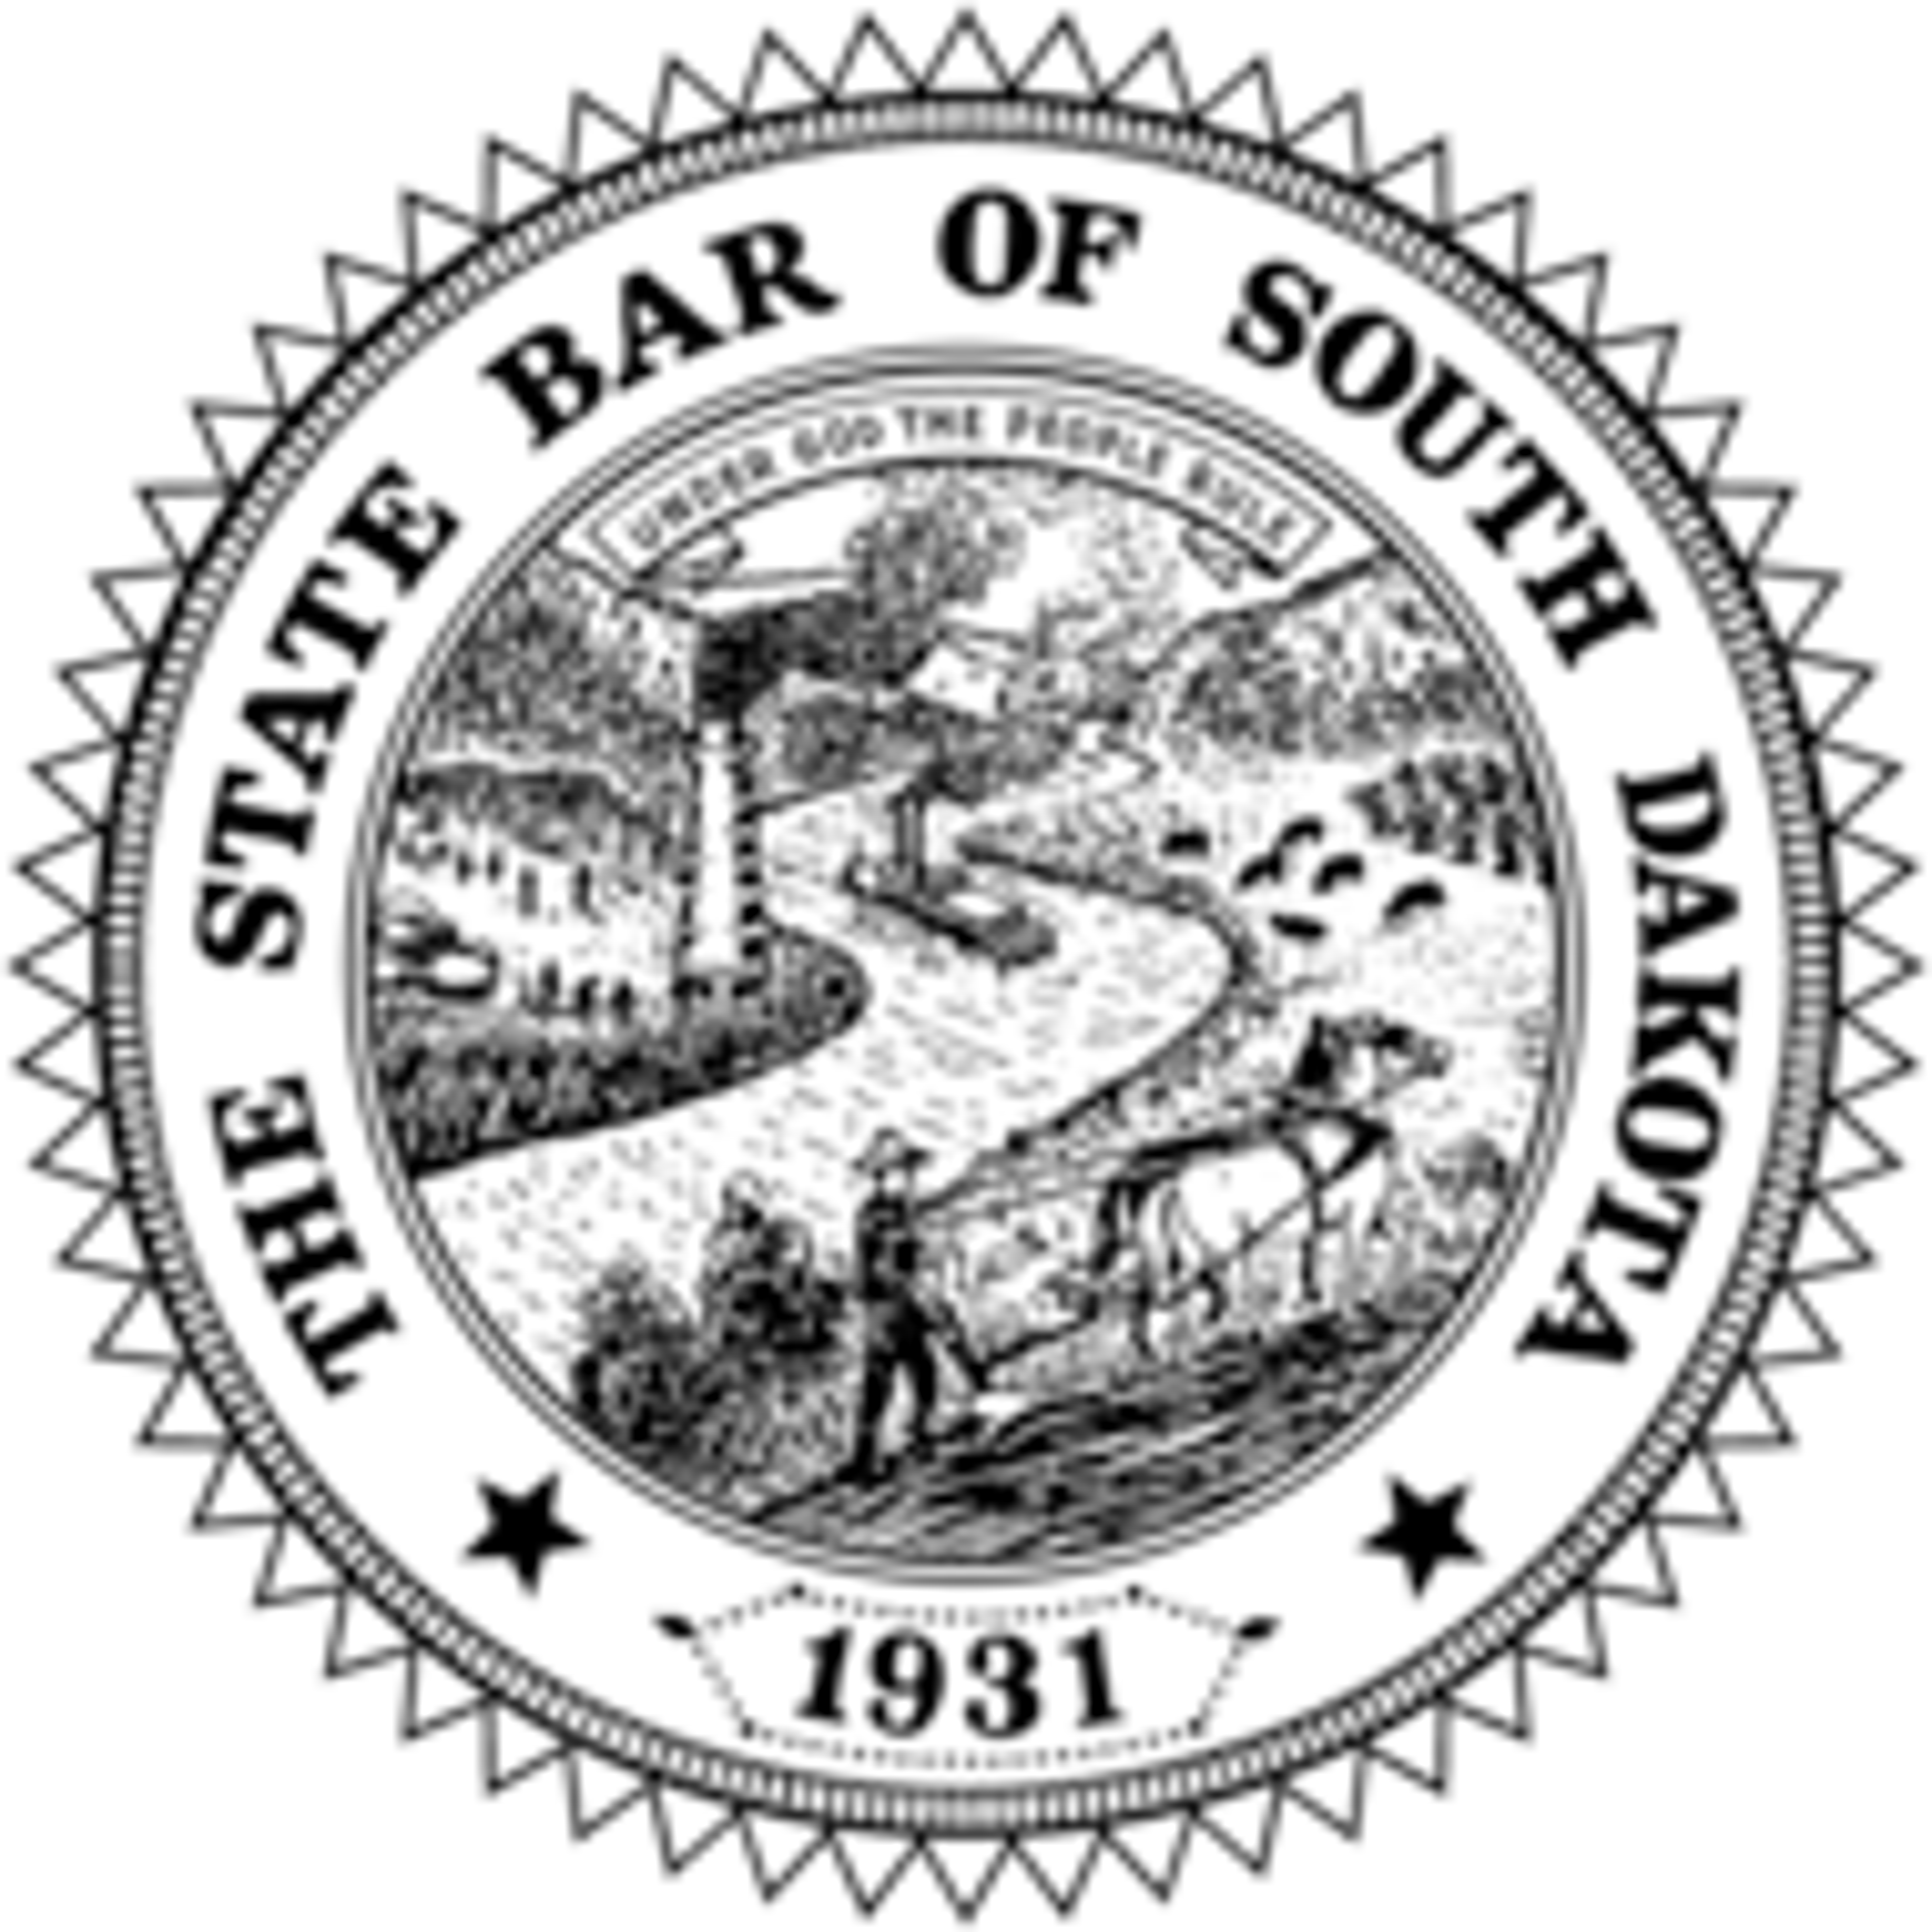 South Dakota State Bar